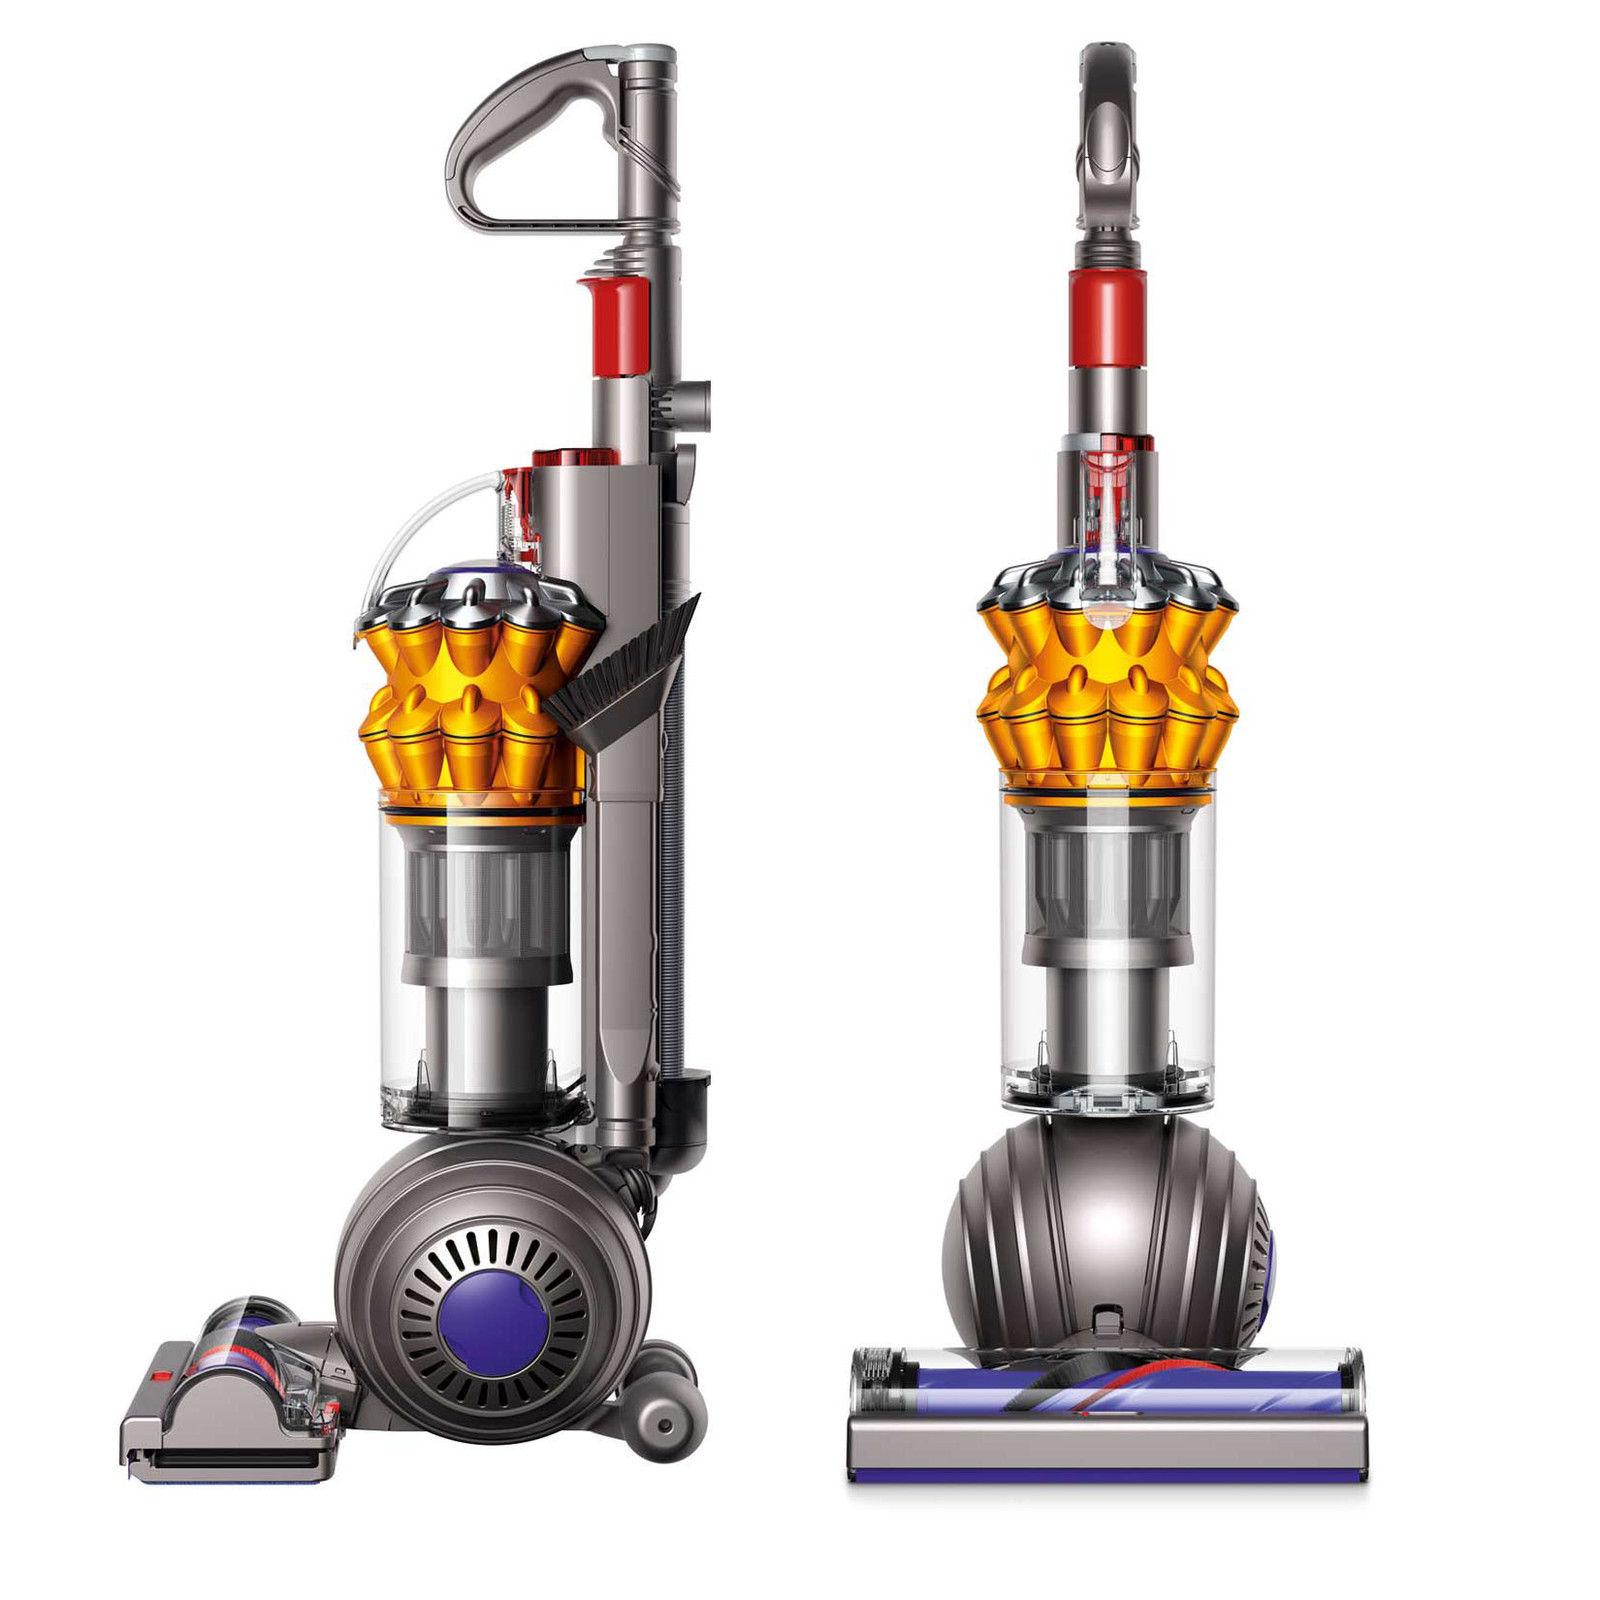 Dyson UP Small Ball Multi Floor Upright Vacuum